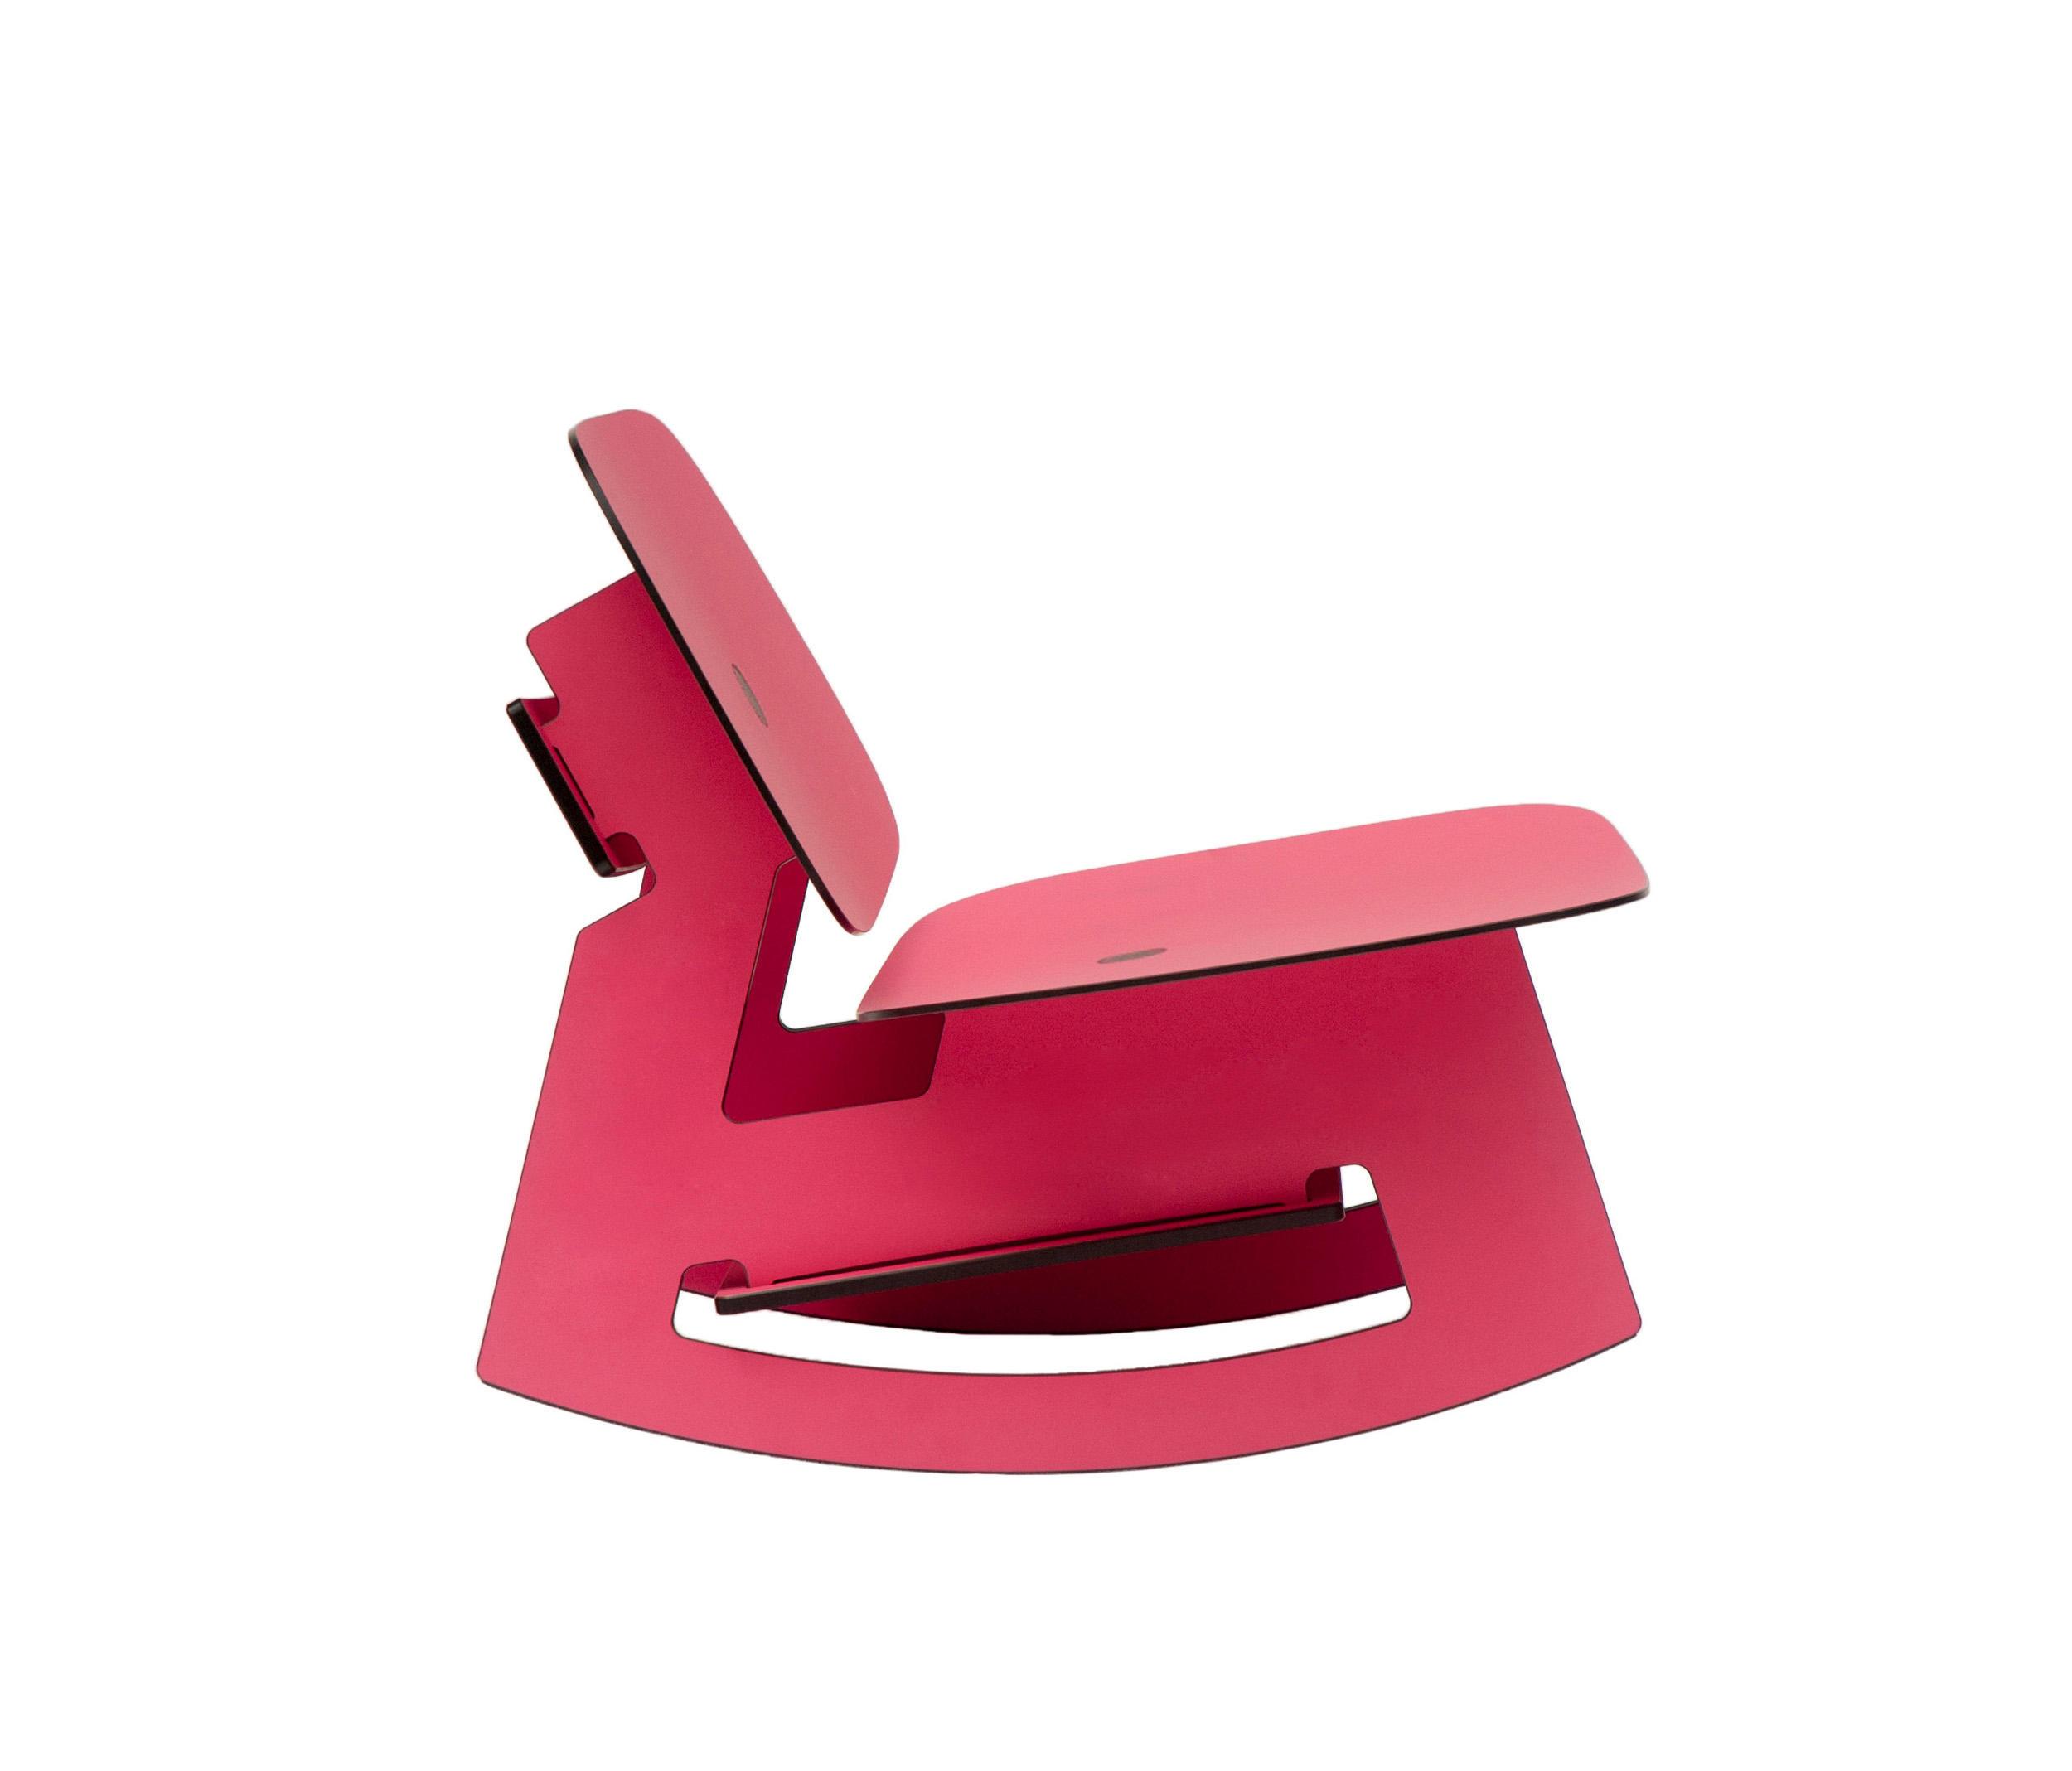 LOBBYIST ROCKER FOR KIDS ROCKING CHAIR Kids chairs from pliet